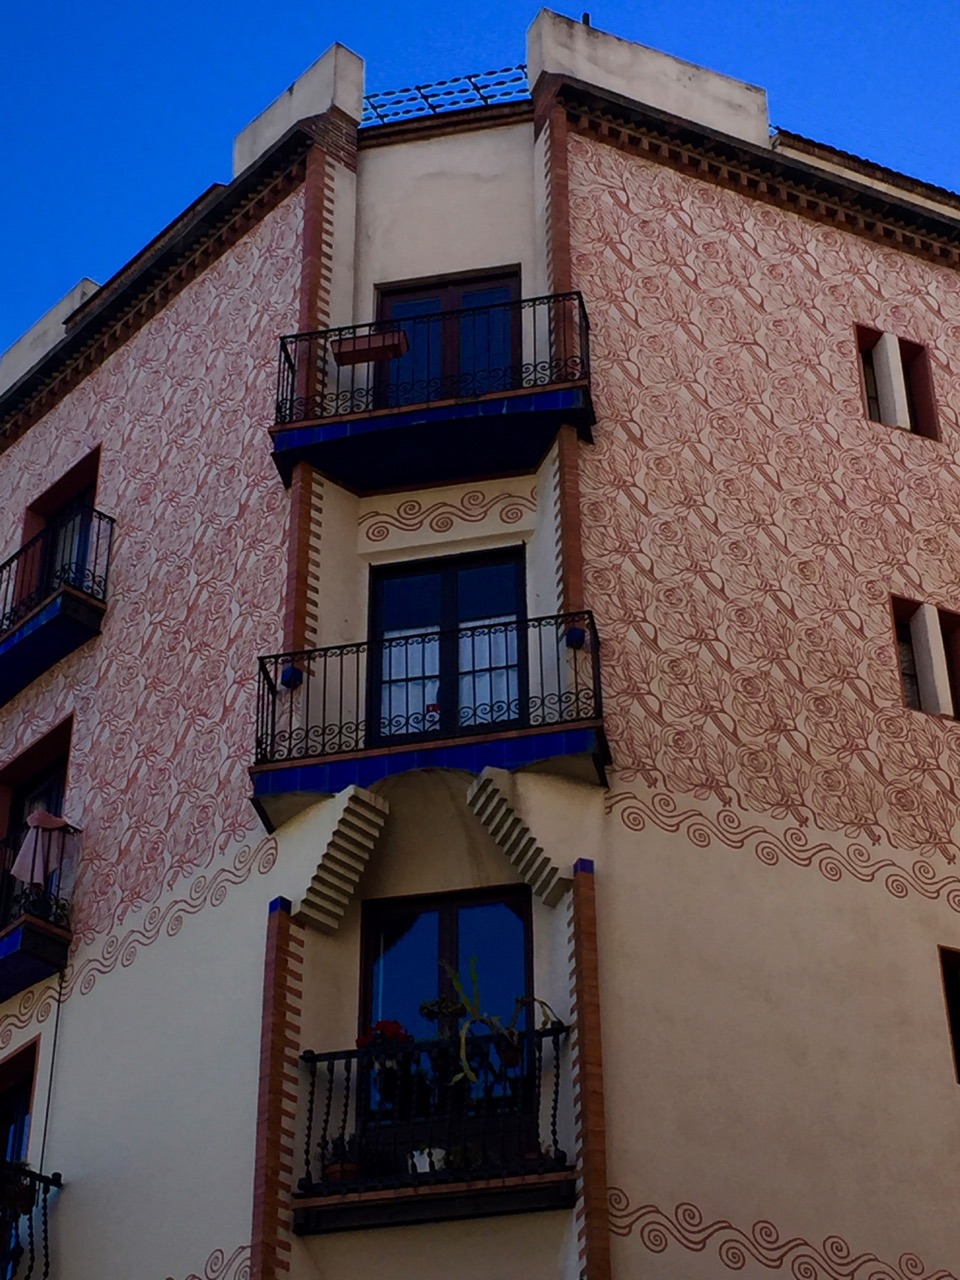 Barcelona blue red building